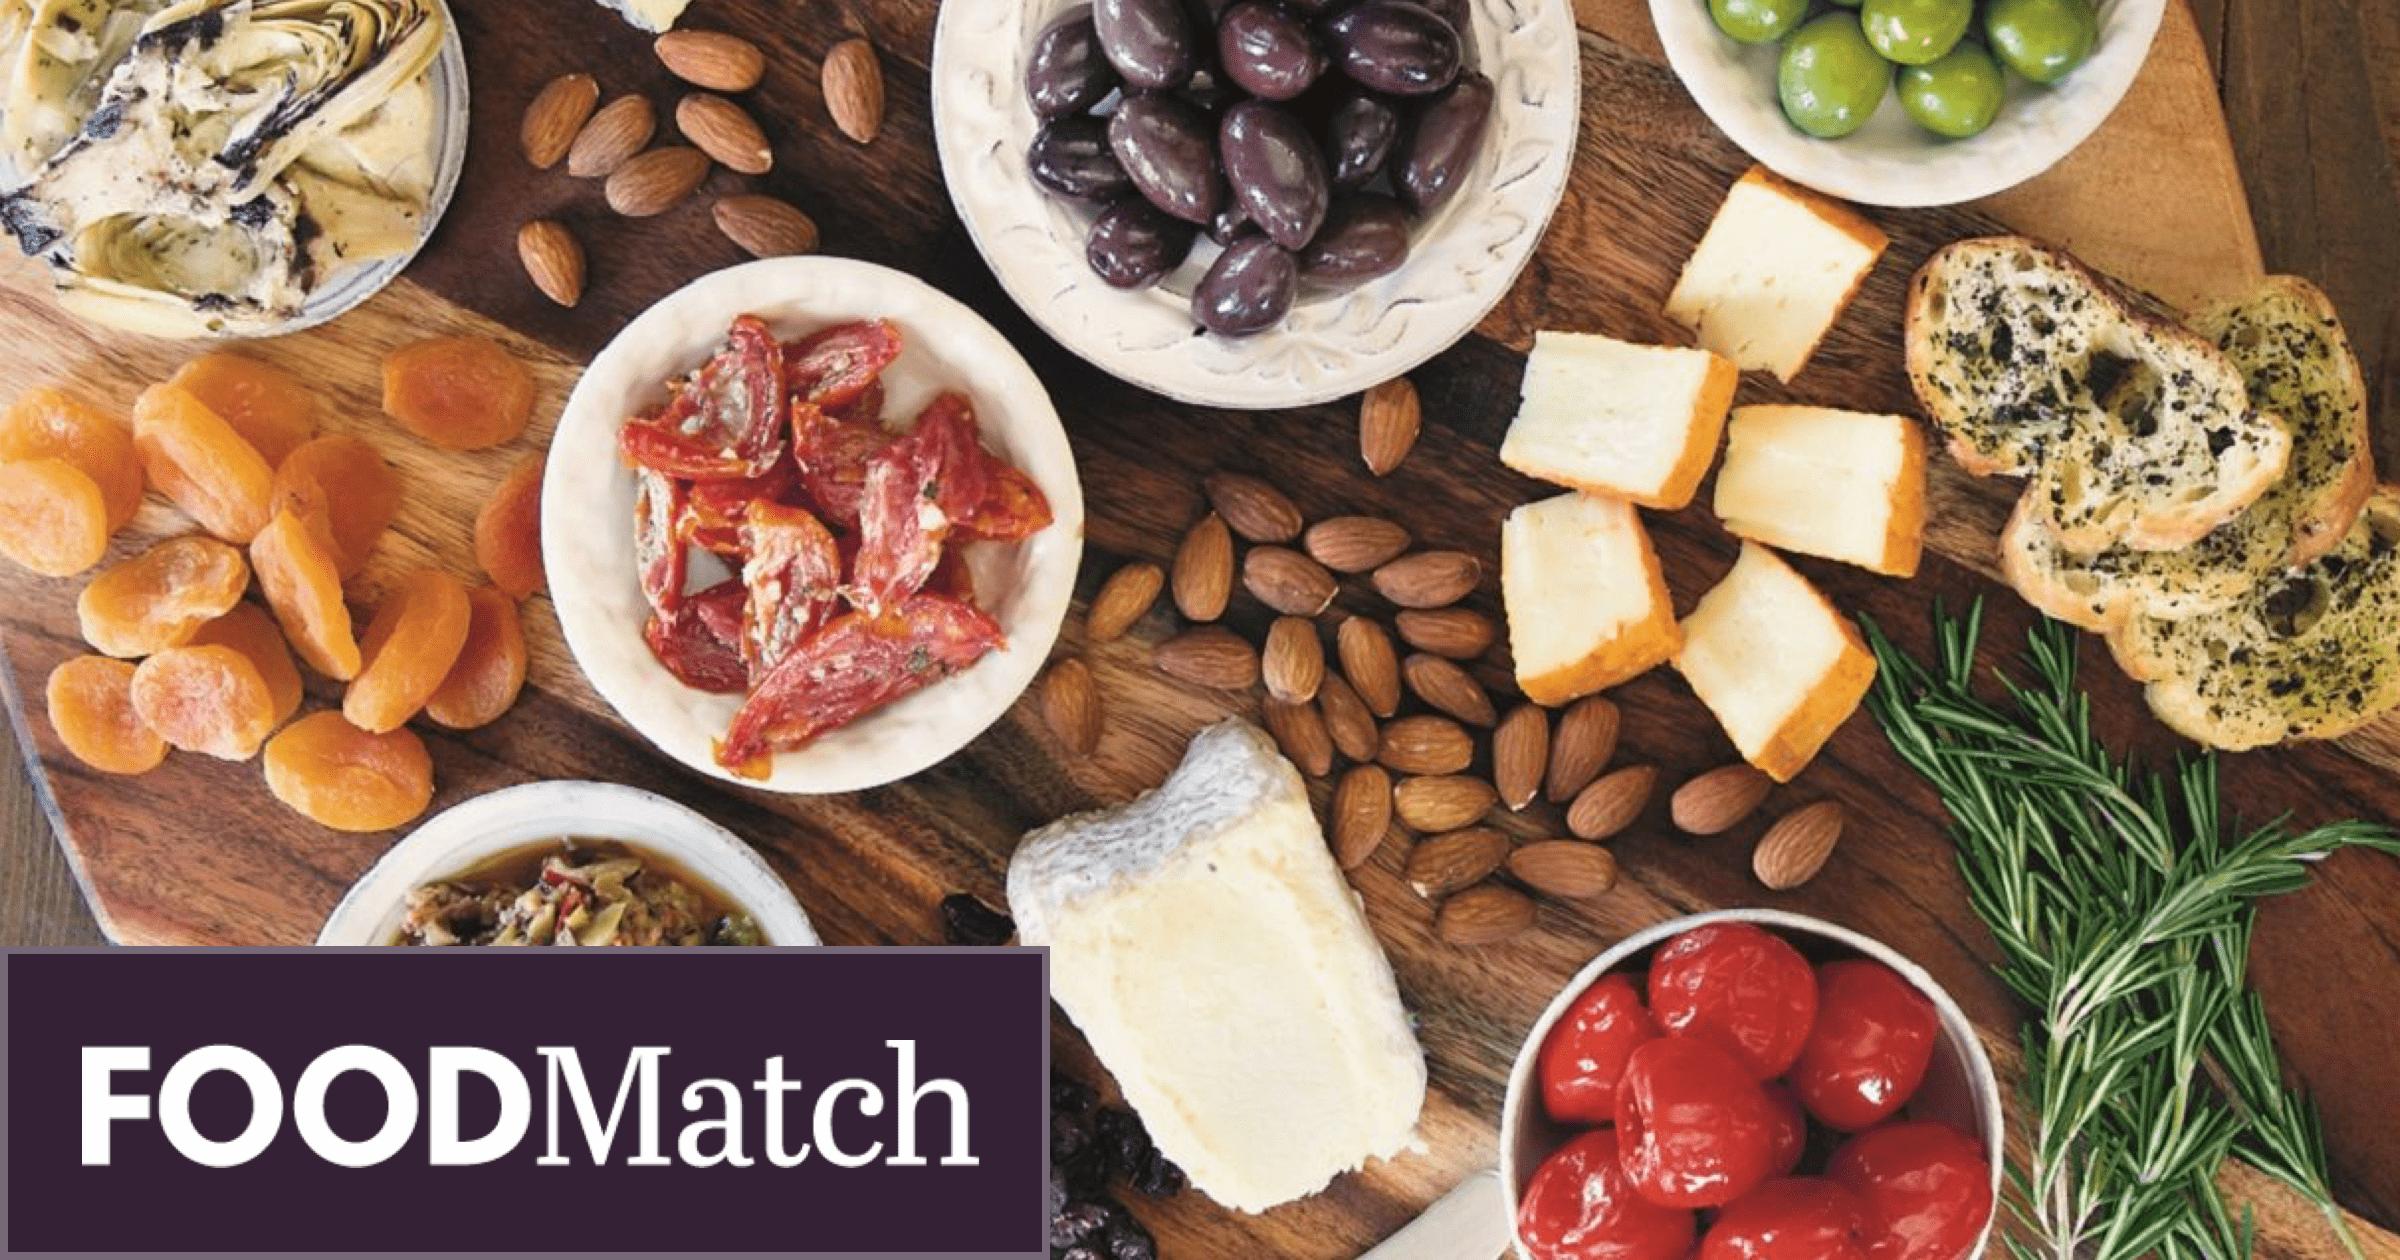 Mediterranean Specialty Foods Importer   FOODMatch + DIVINA